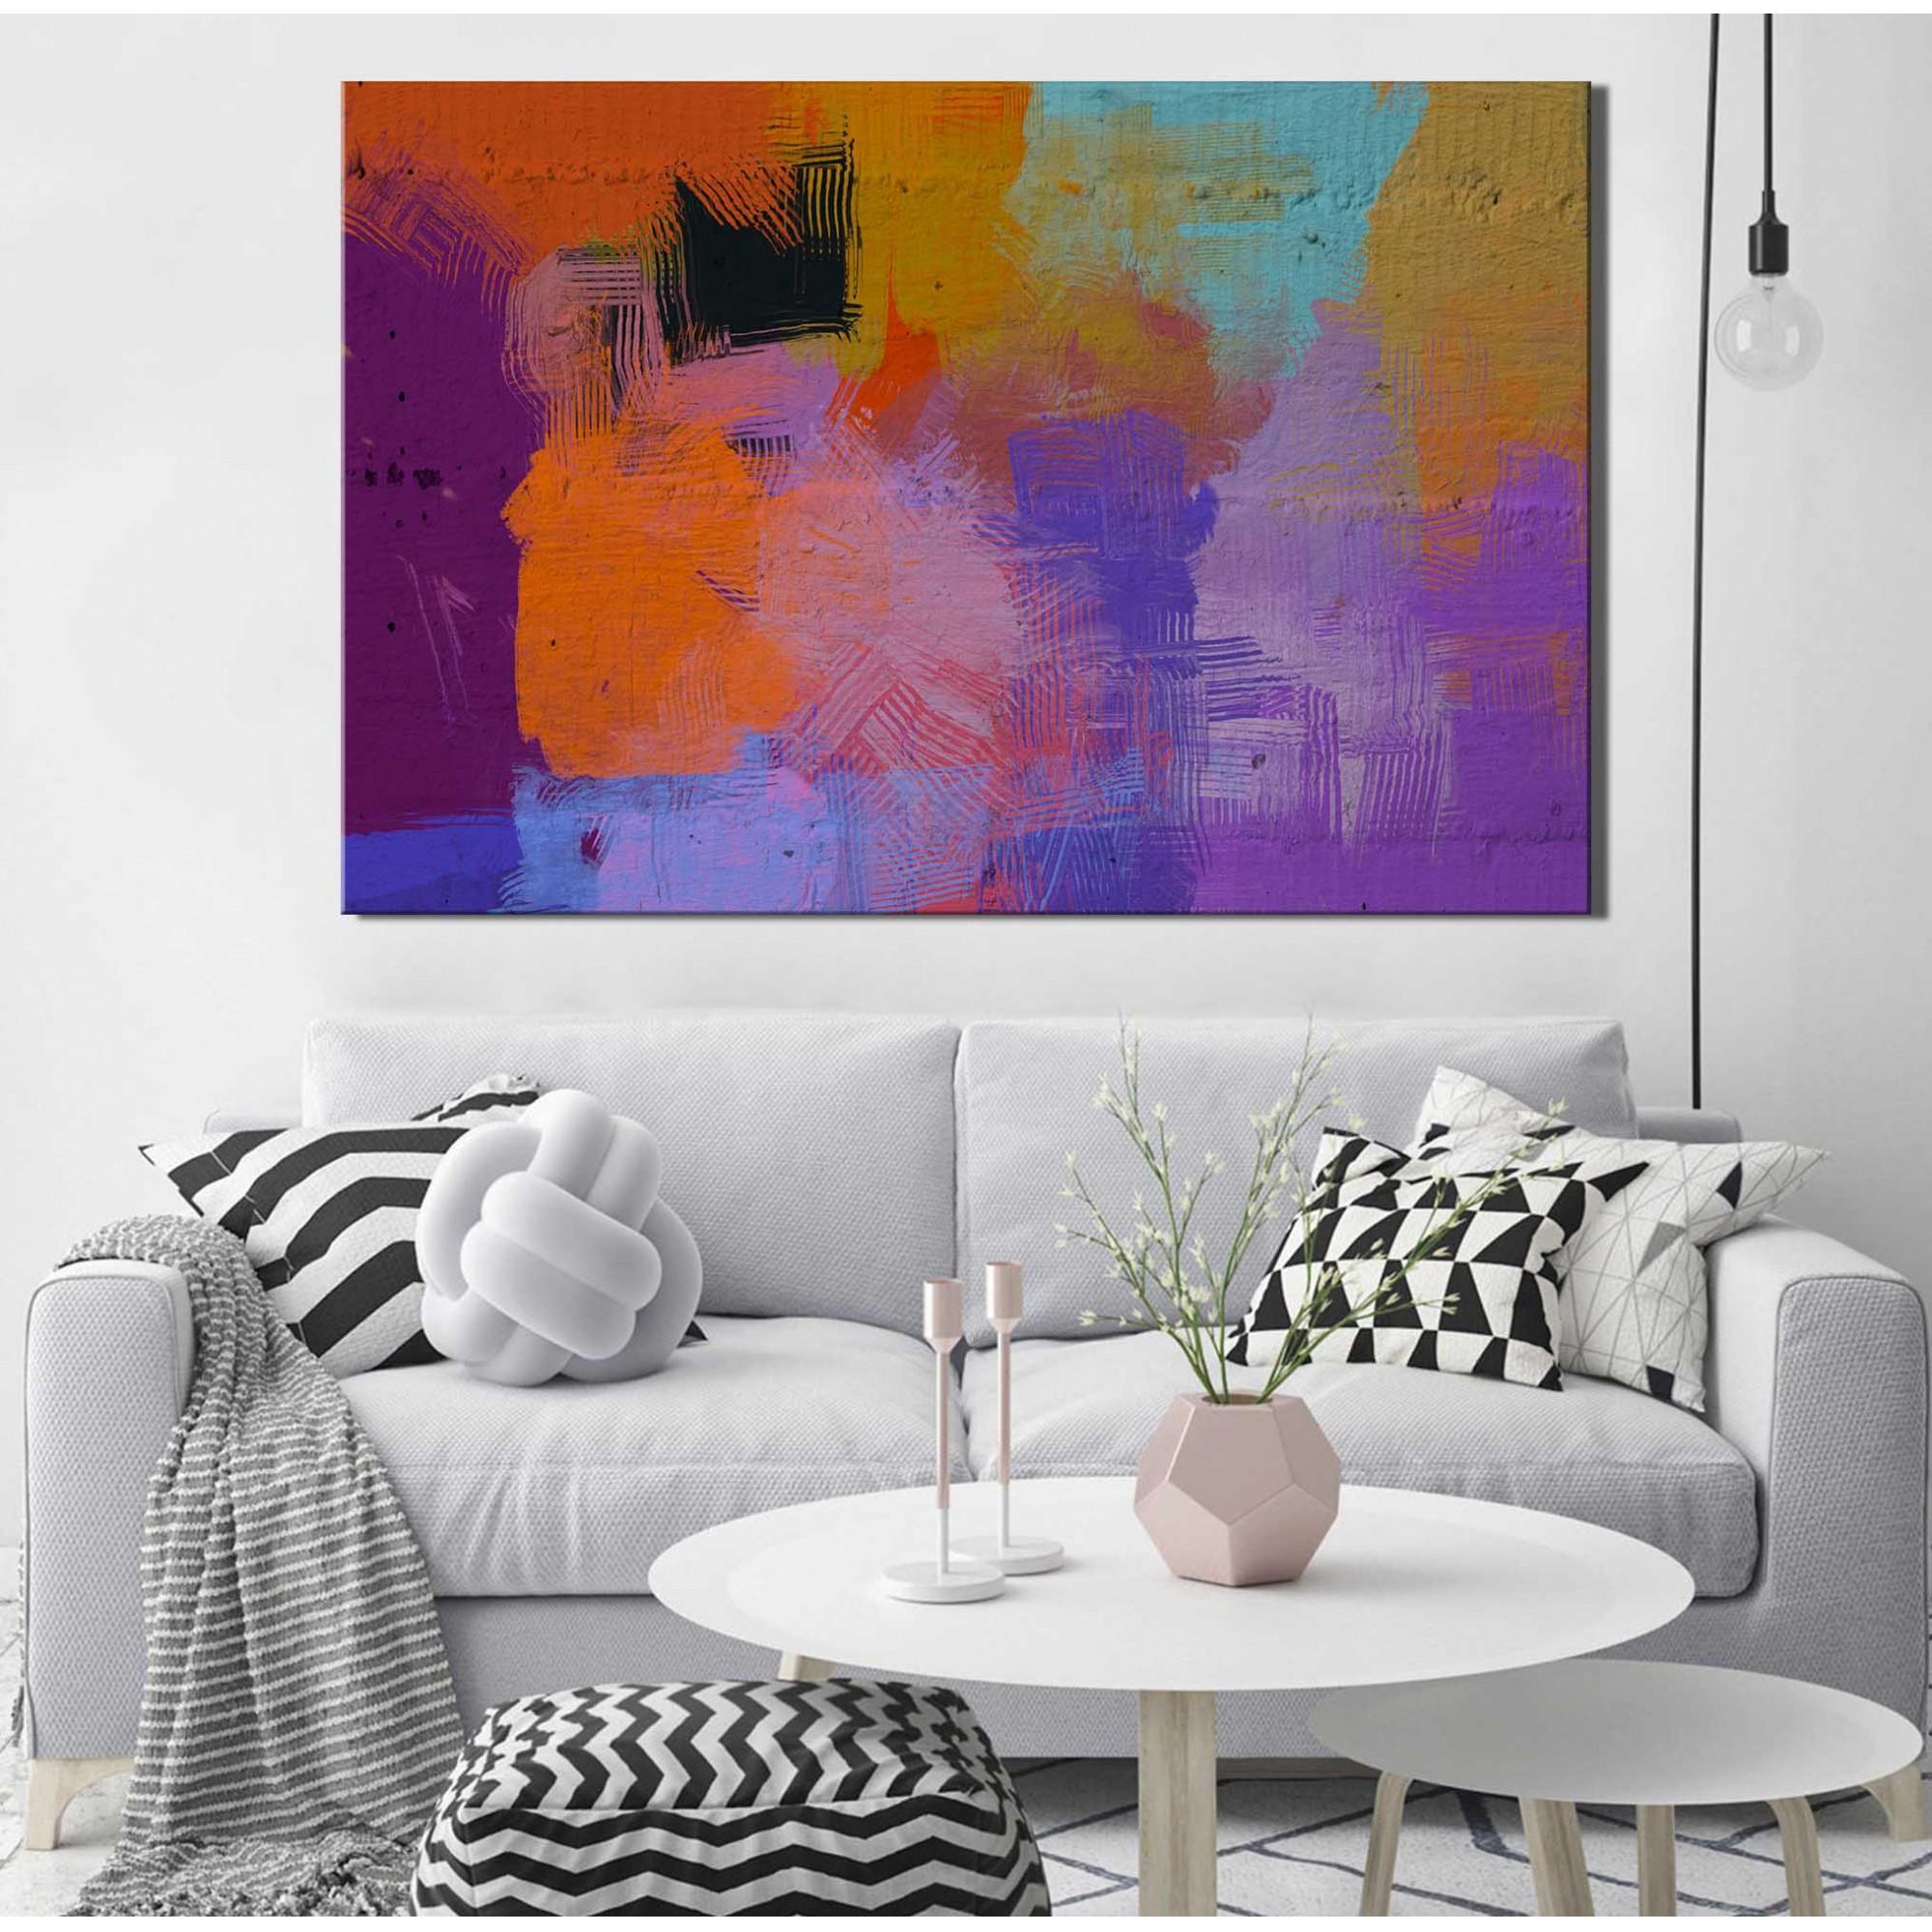 Quadro Decorativo Abstrato Roxo e Laranja 1 peça